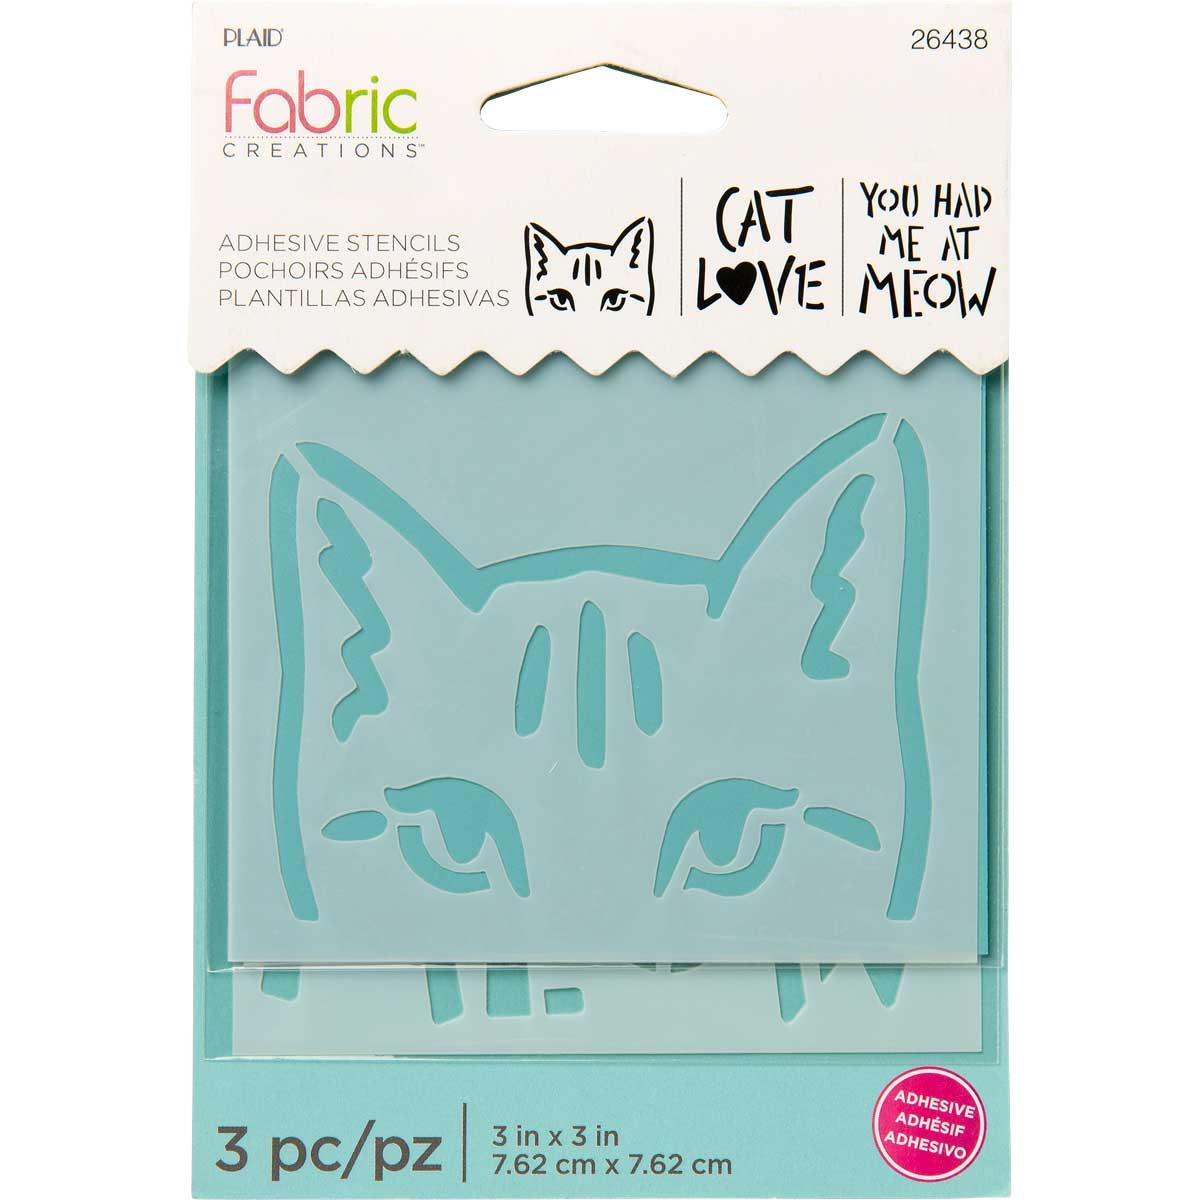 Fabric Creations™ Adhesive Stencils - Mini - Cat, 3